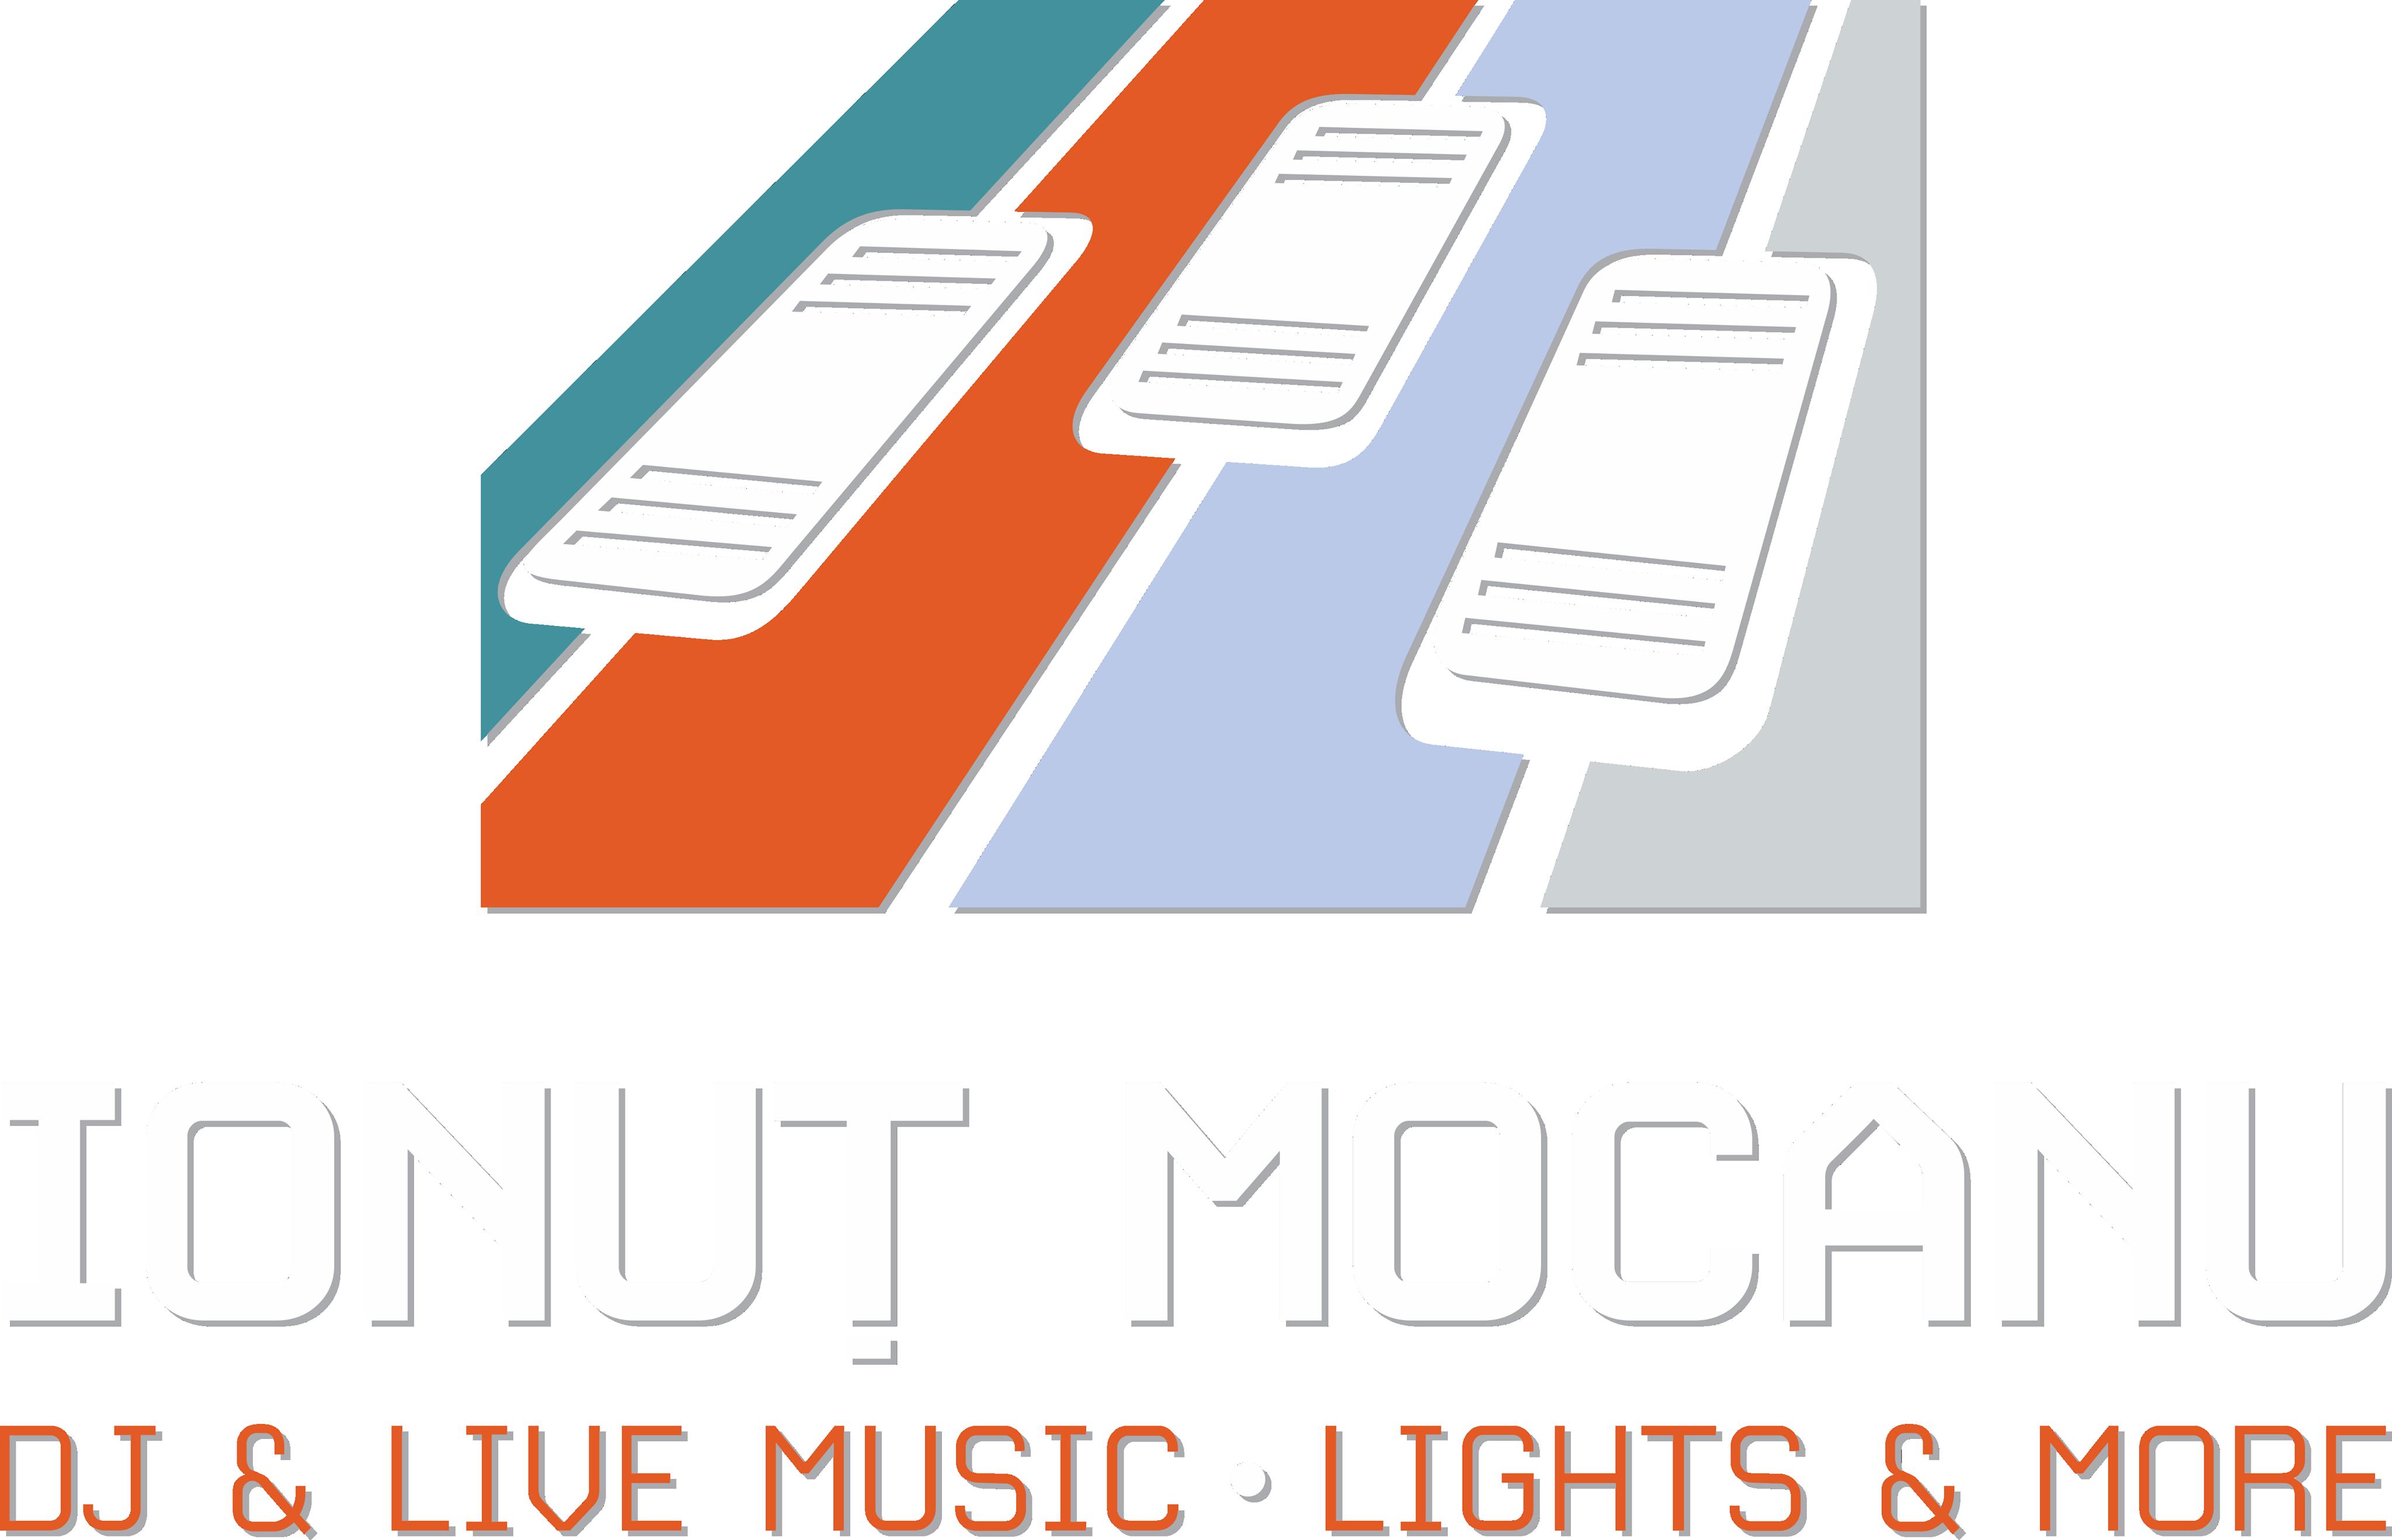 Ionut Mocanu – DJ Nunta Bacau, DJ Nunta Iasi, DJ Nunta Focsani, DJ Nunta Piatra Neamt